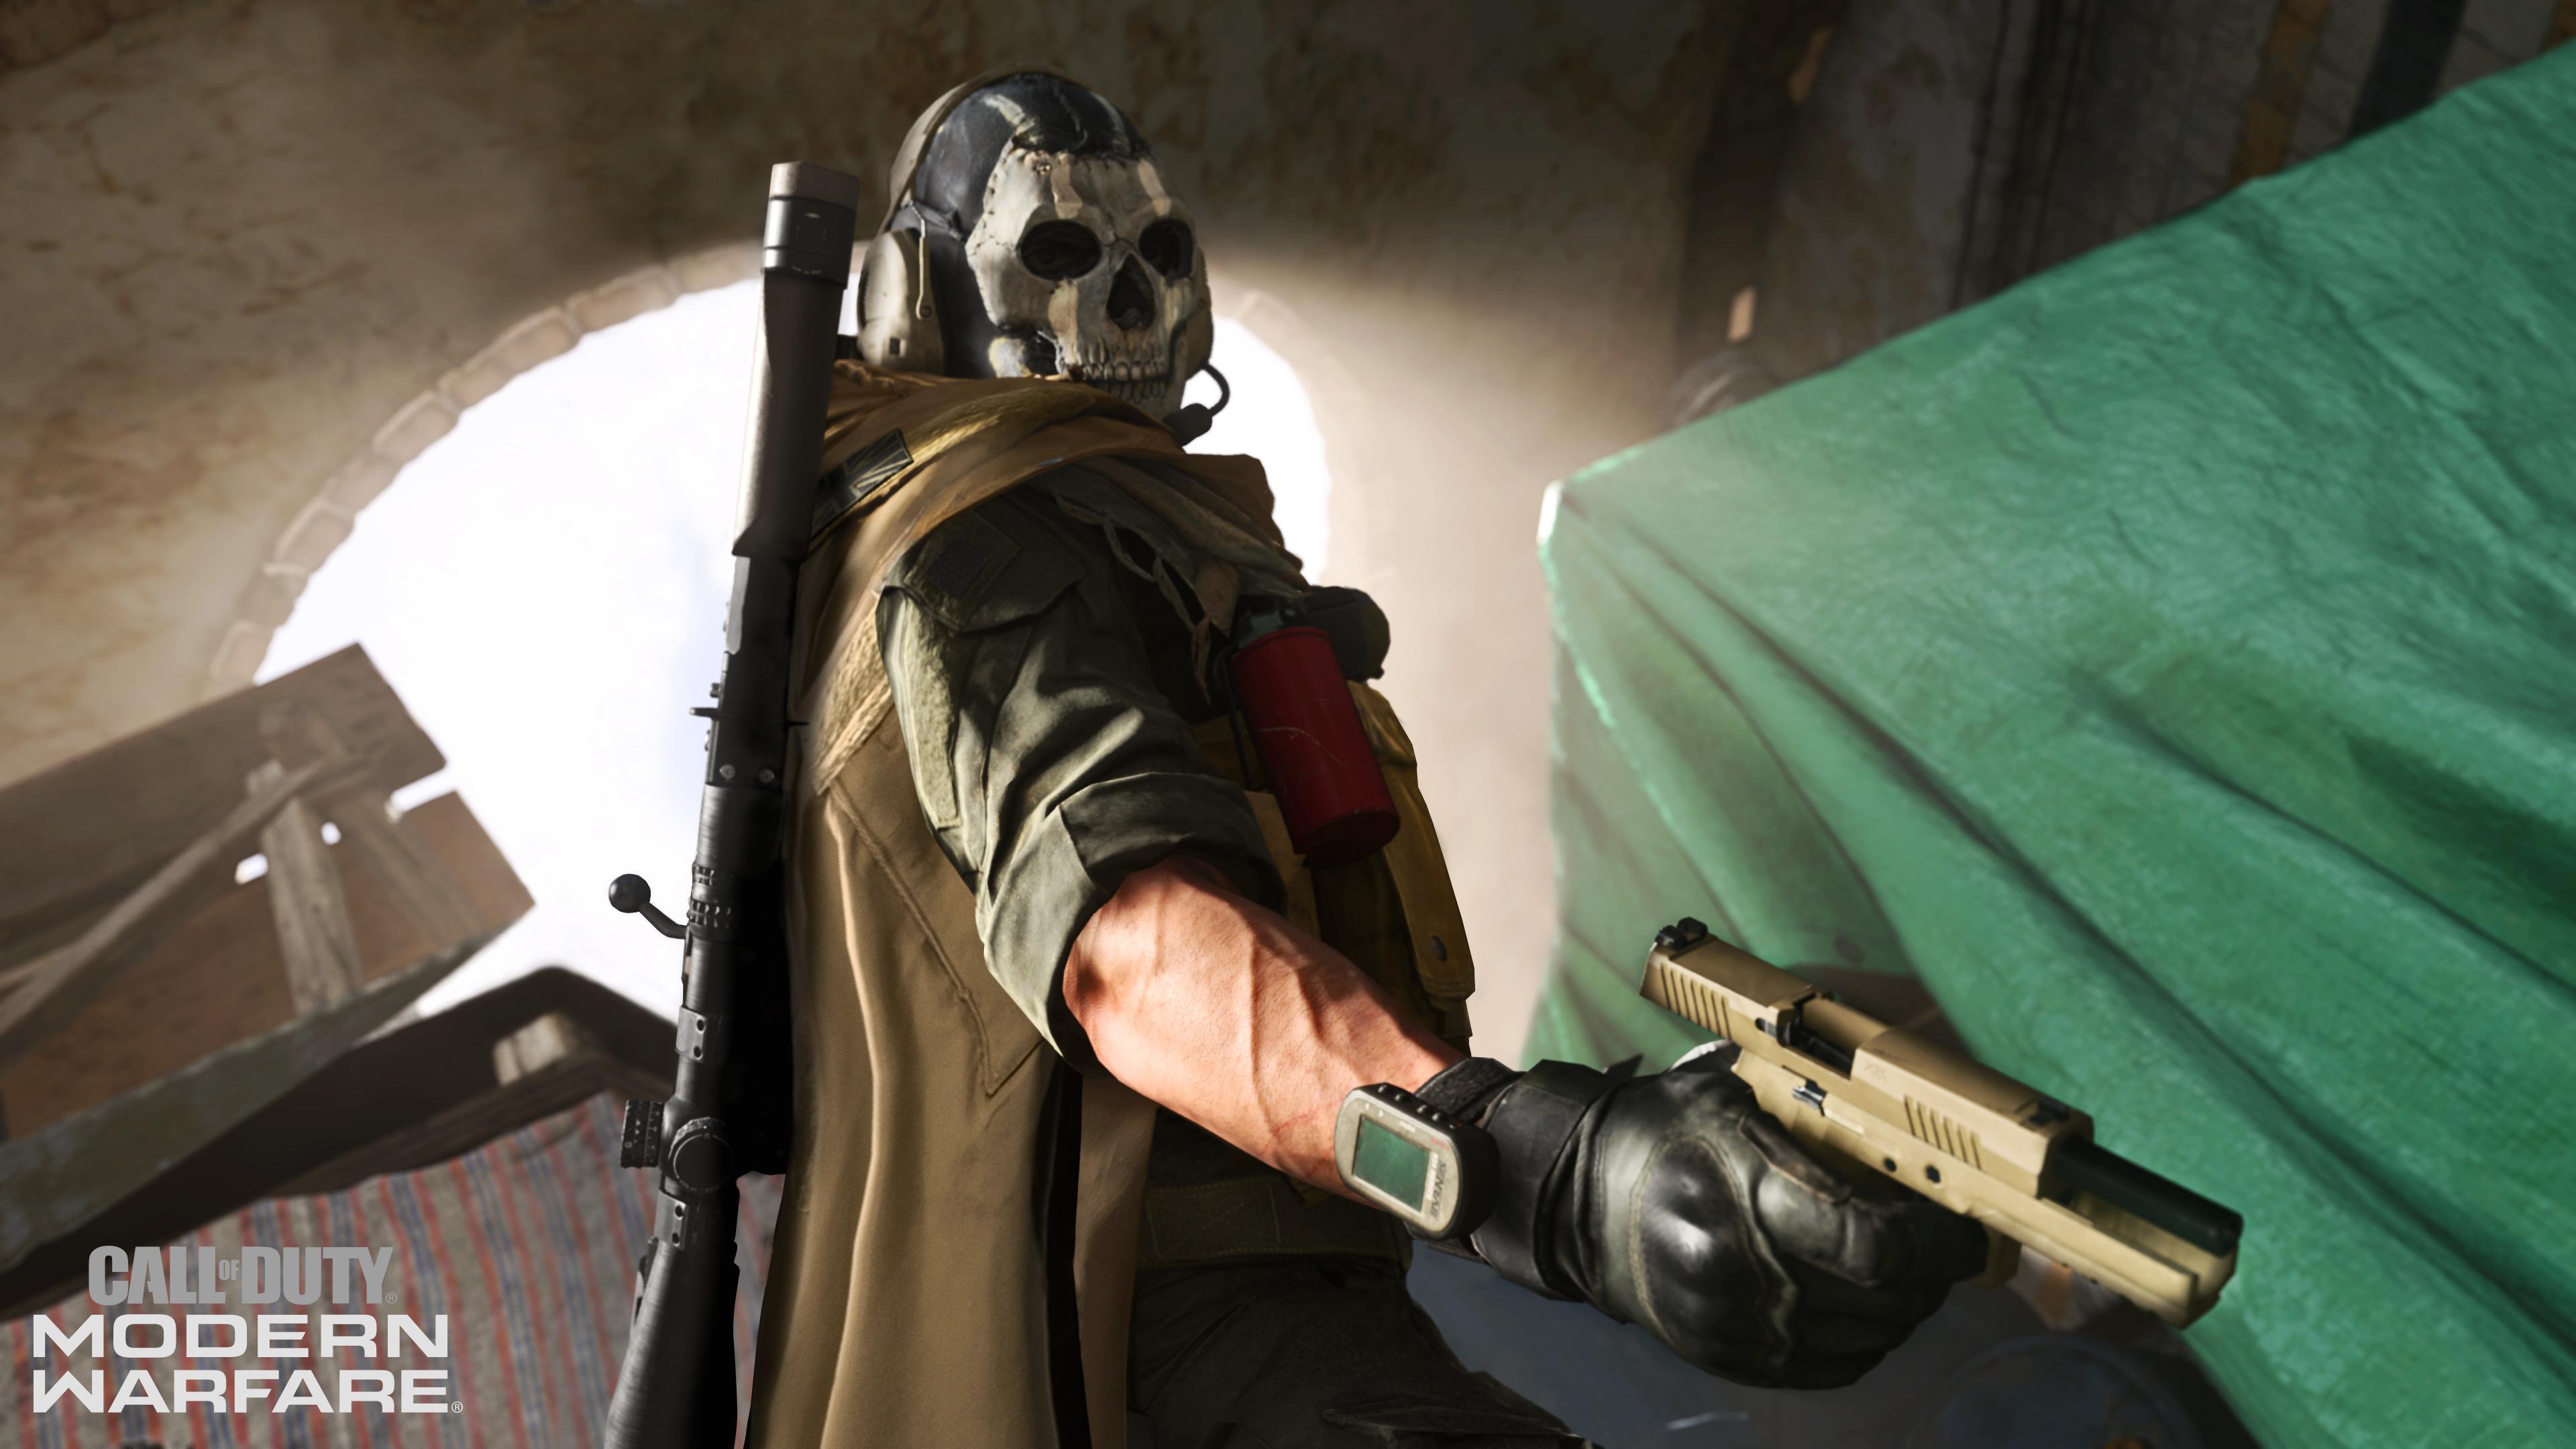 Call Of Duty Modern Warfare 4k Ultra Hd Wallpaper Background